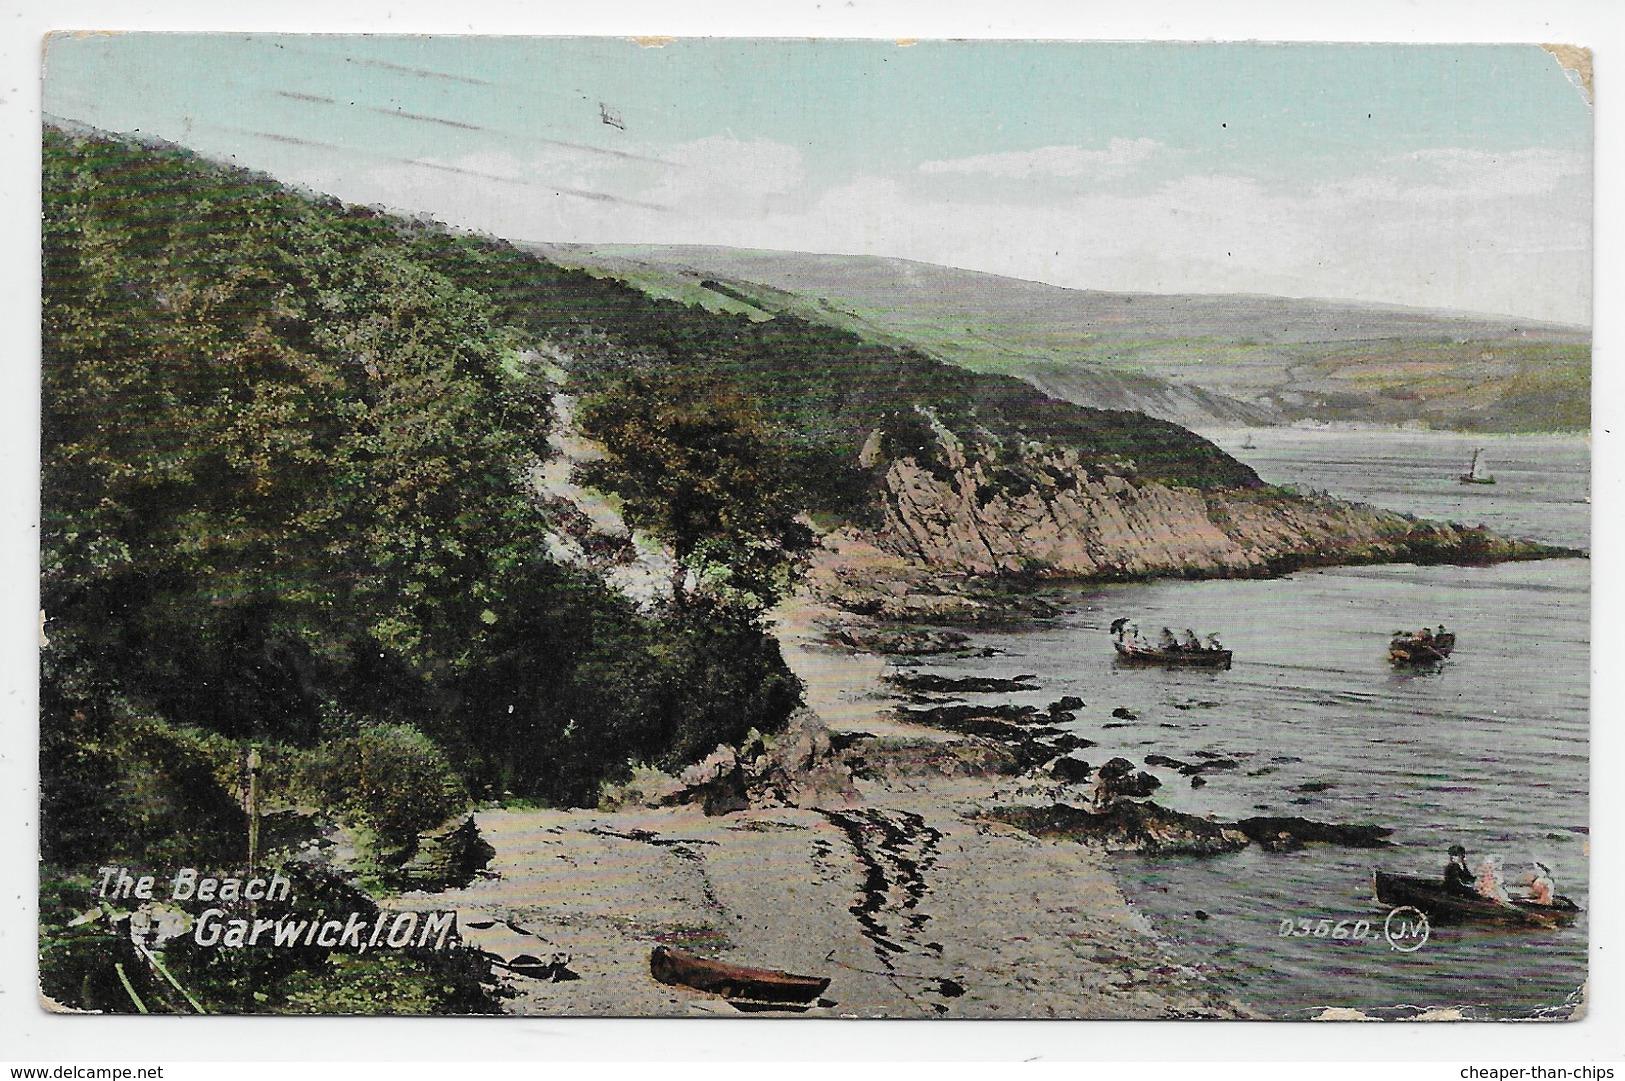 The Beach, Garwick, I.O.M. - Valentine Souvenir Series 03660 - Isle Of Man